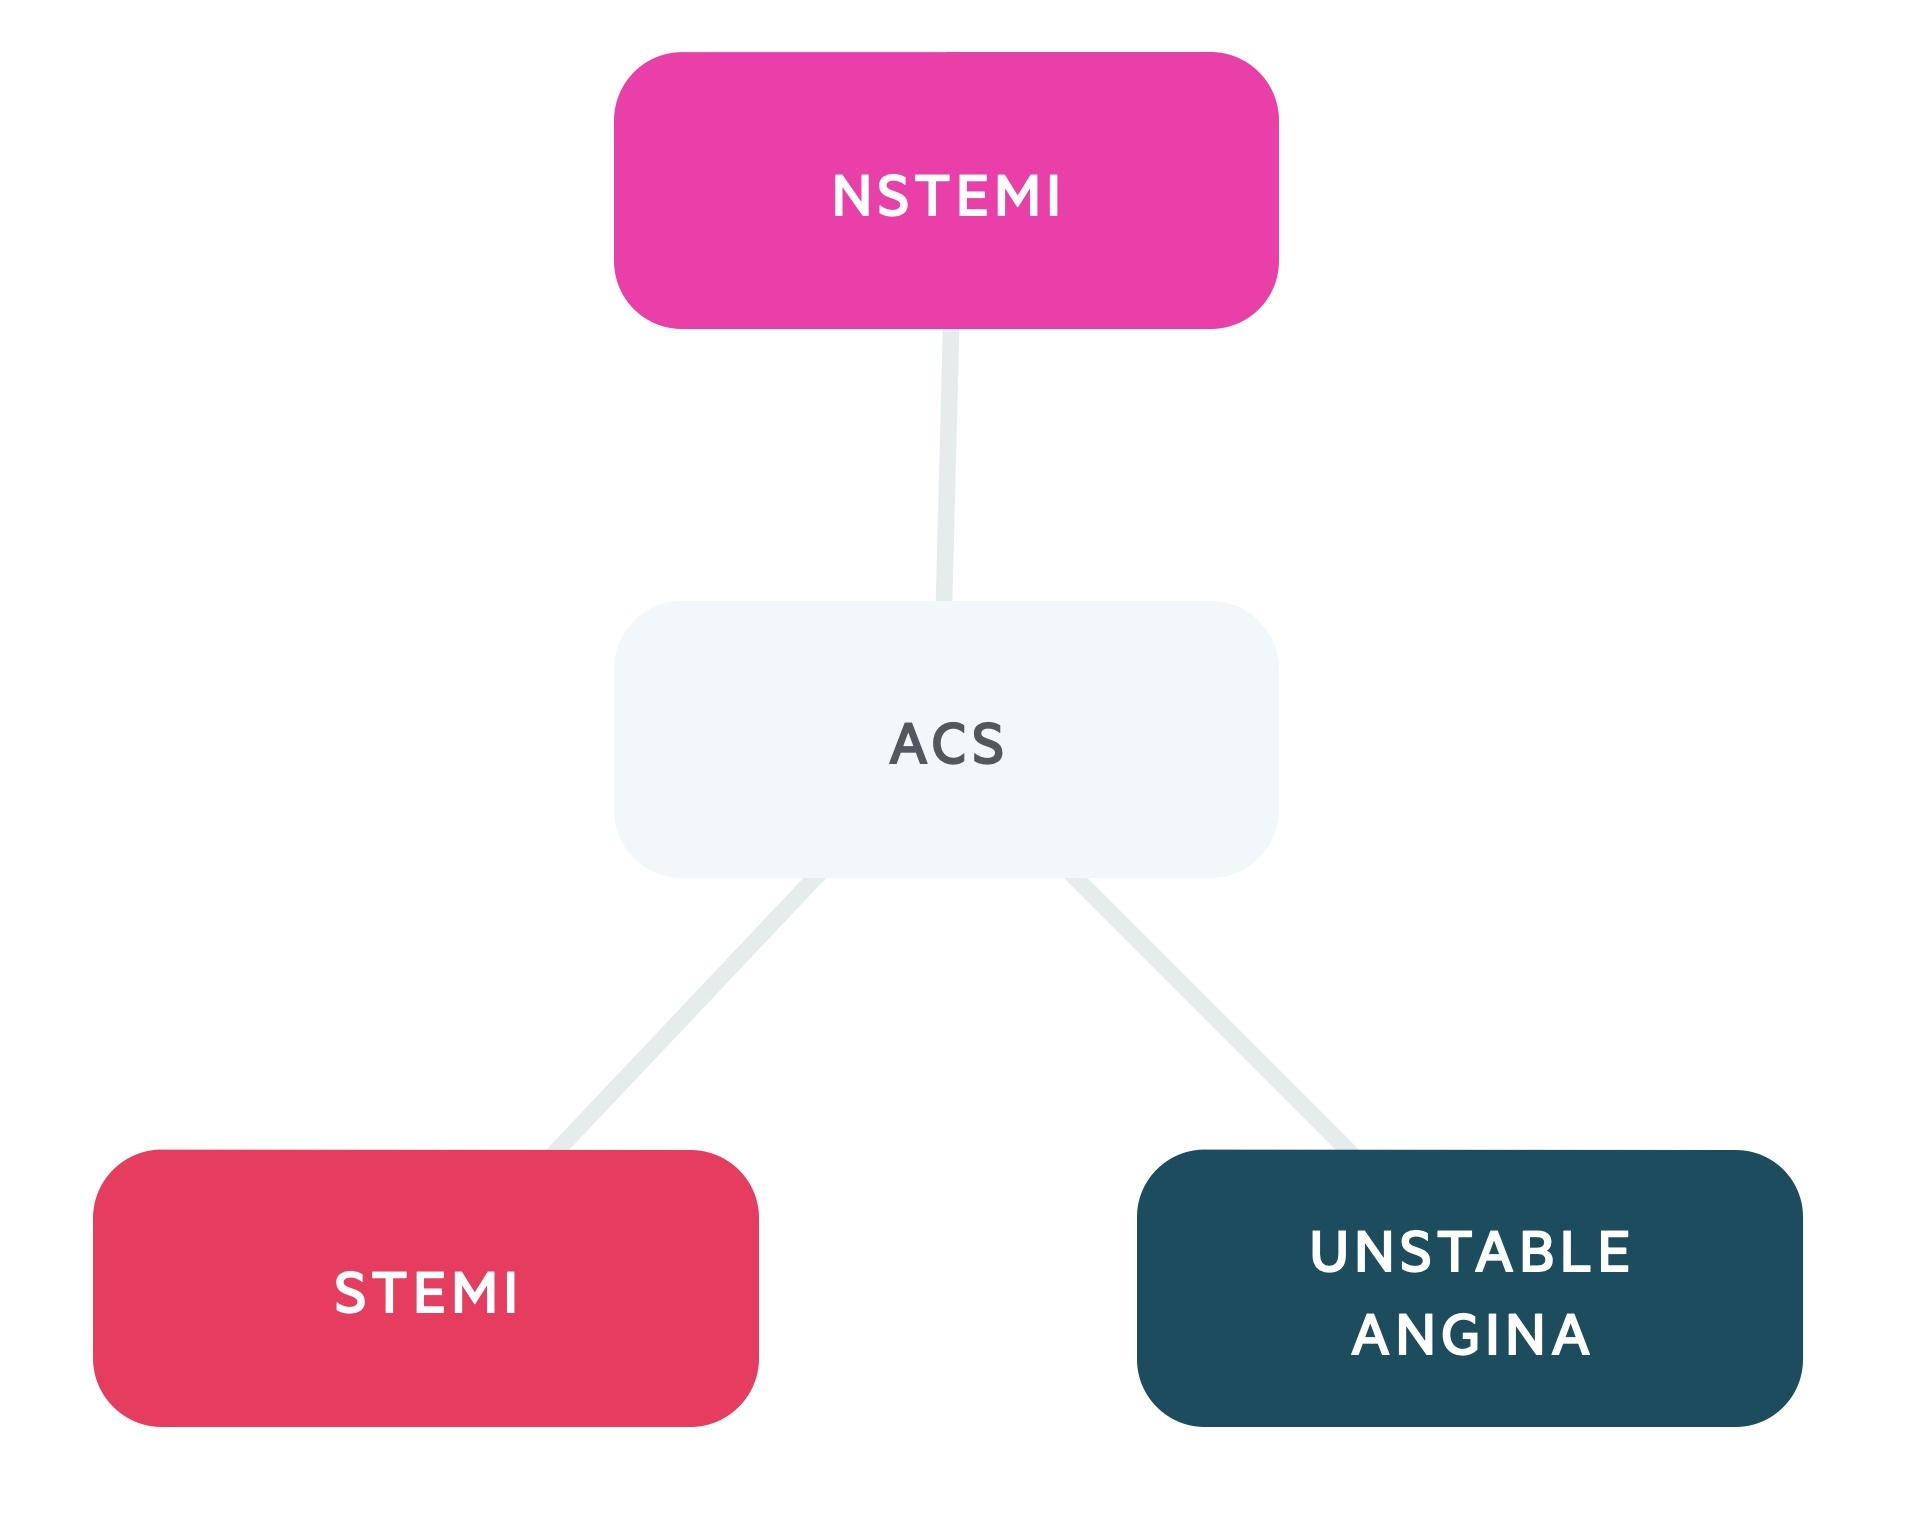 Types of ACS